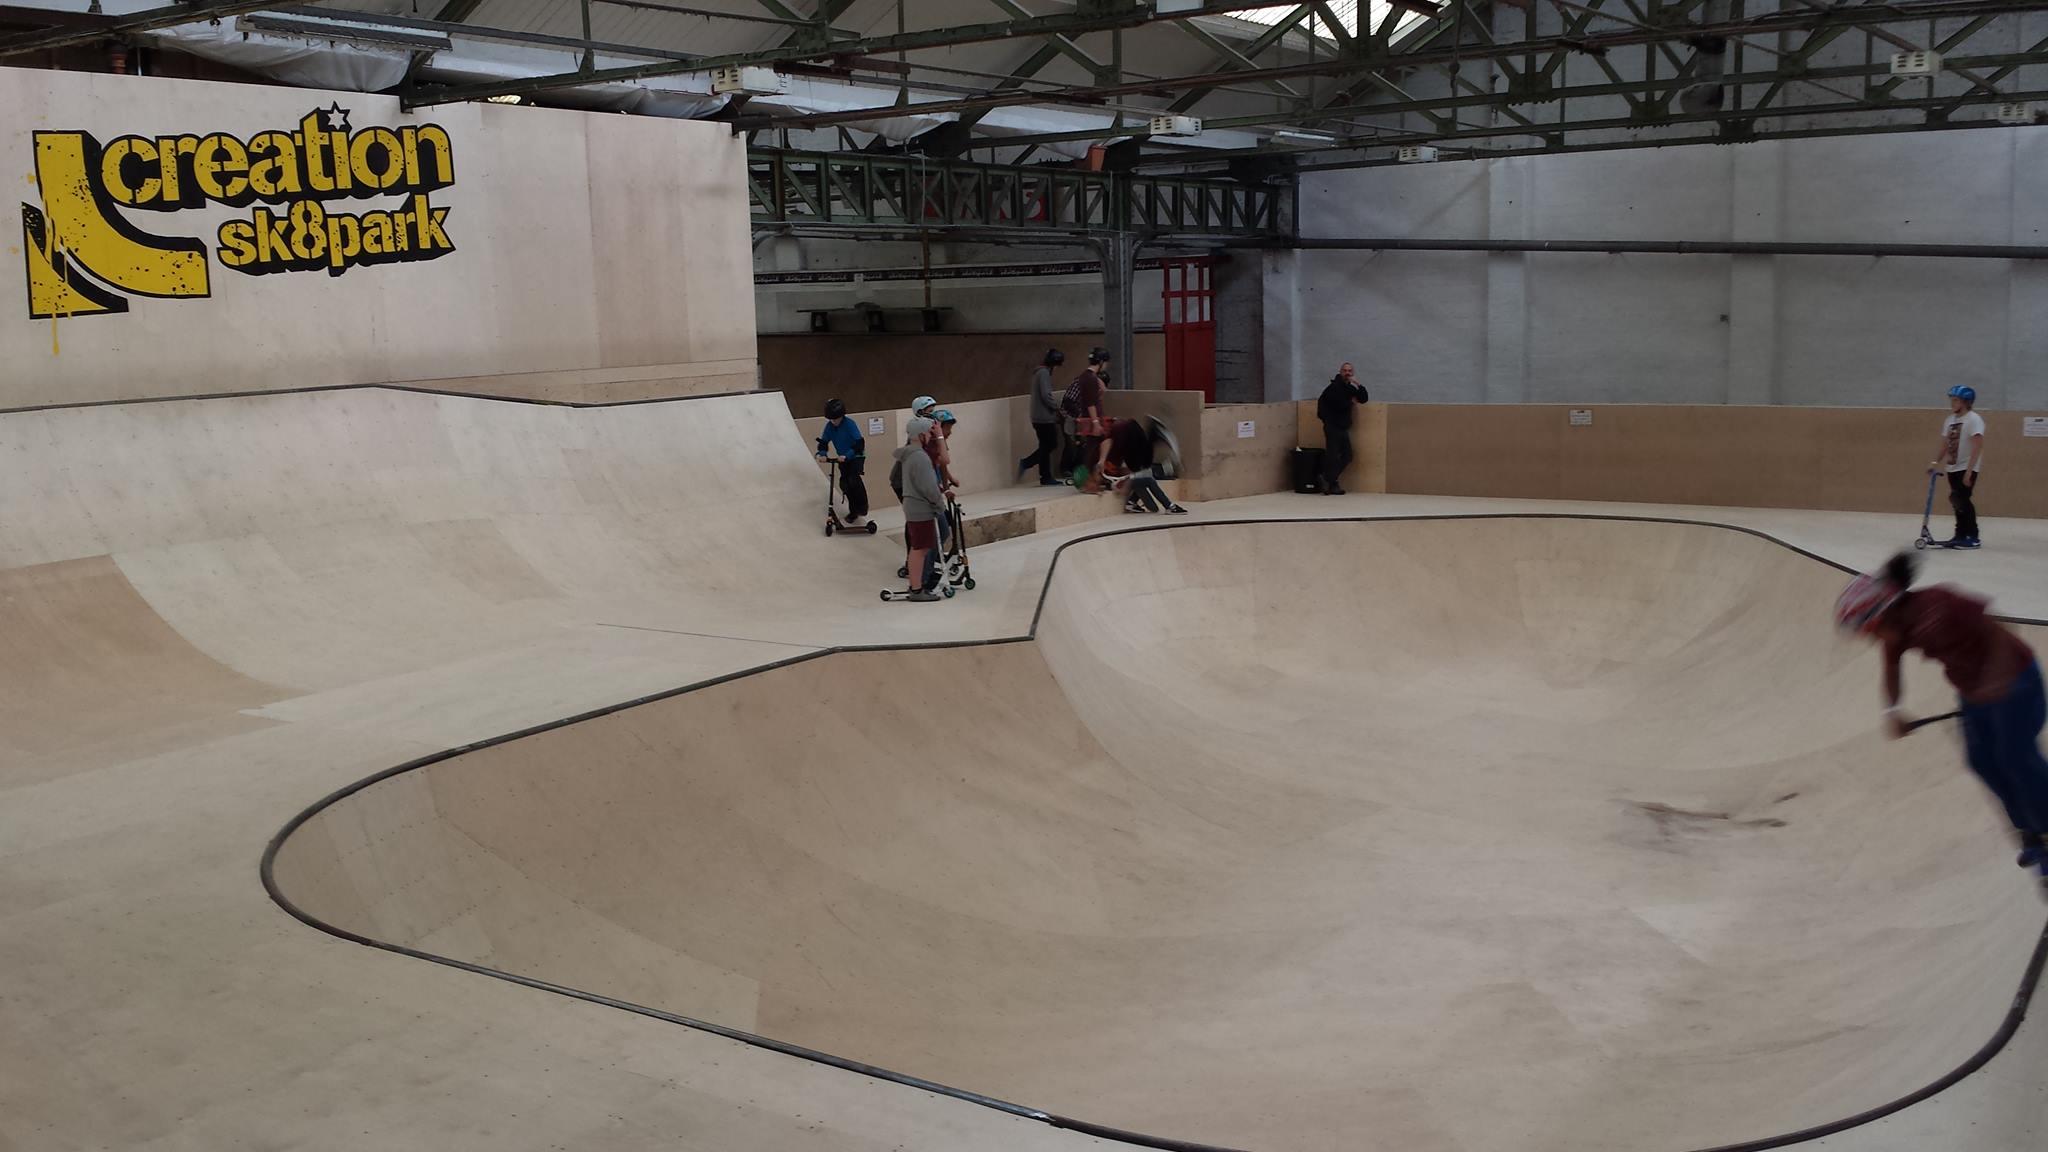 The Bowl Complex Creation Skatepark Birmingham